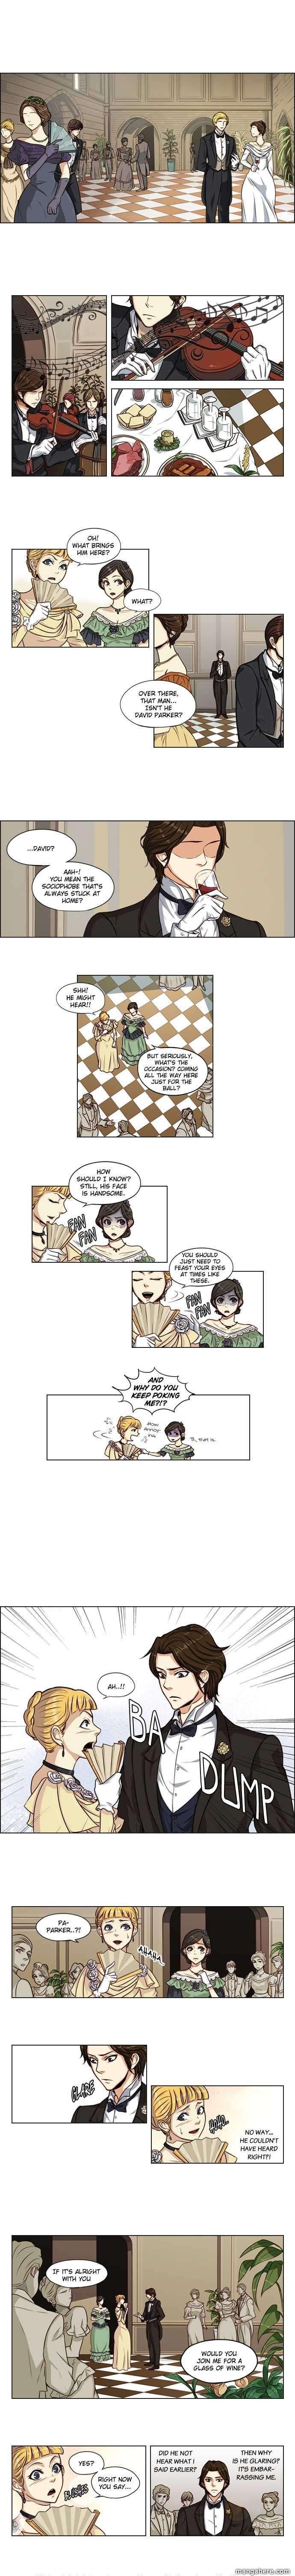 Serendipity 1 Page 1